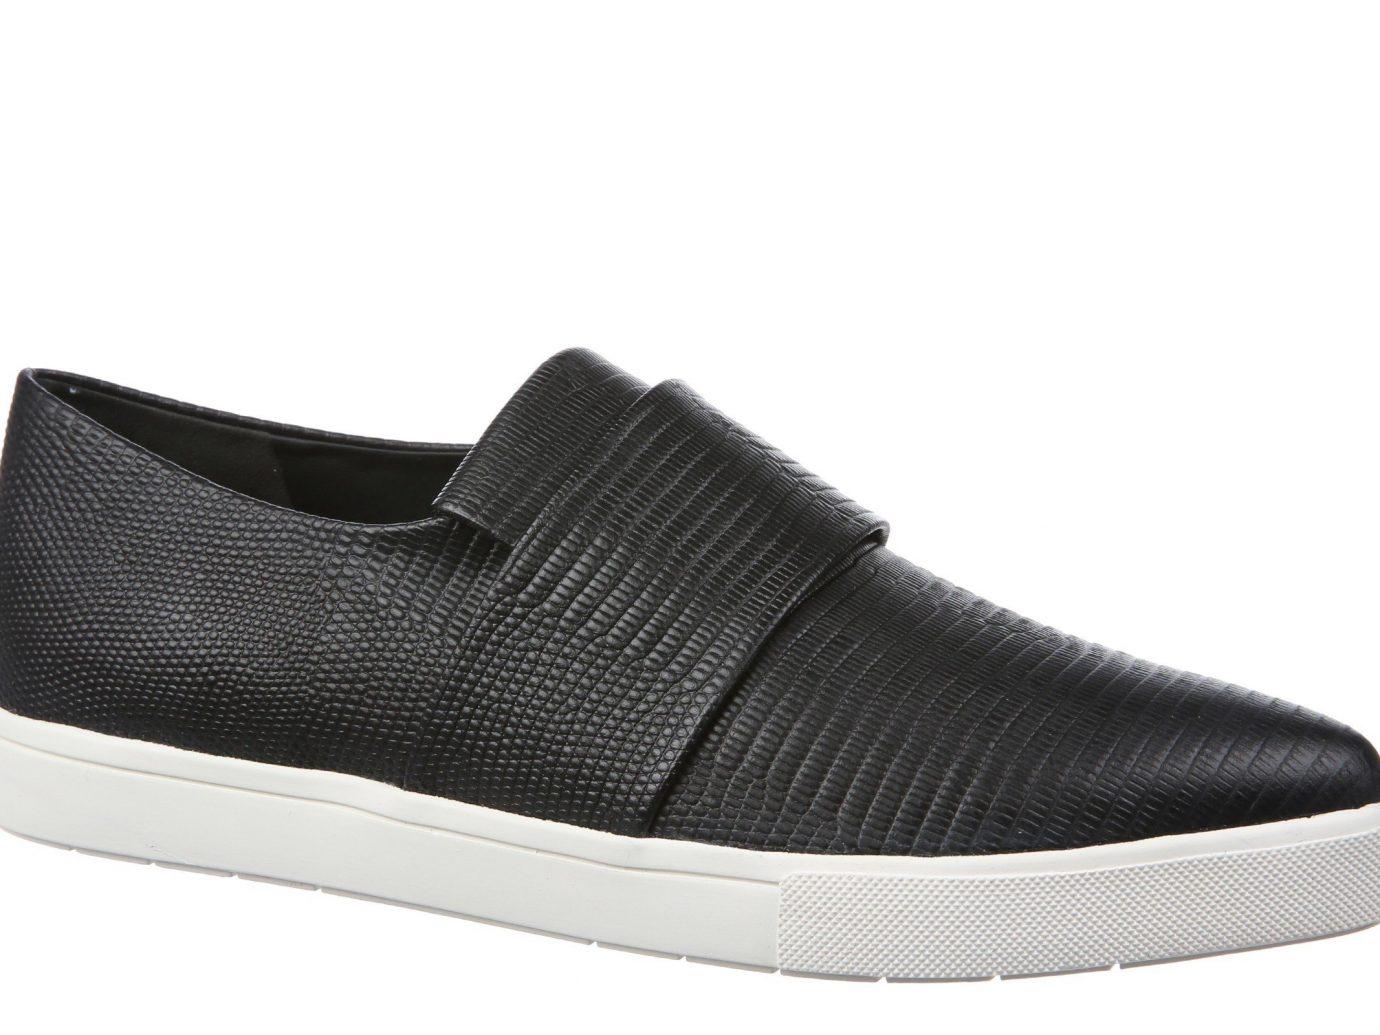 Style + Design footwear shoe product athletic shoe suit sneakers leather black walking shoe skate shoe outdoor shoe cross training shoe textile